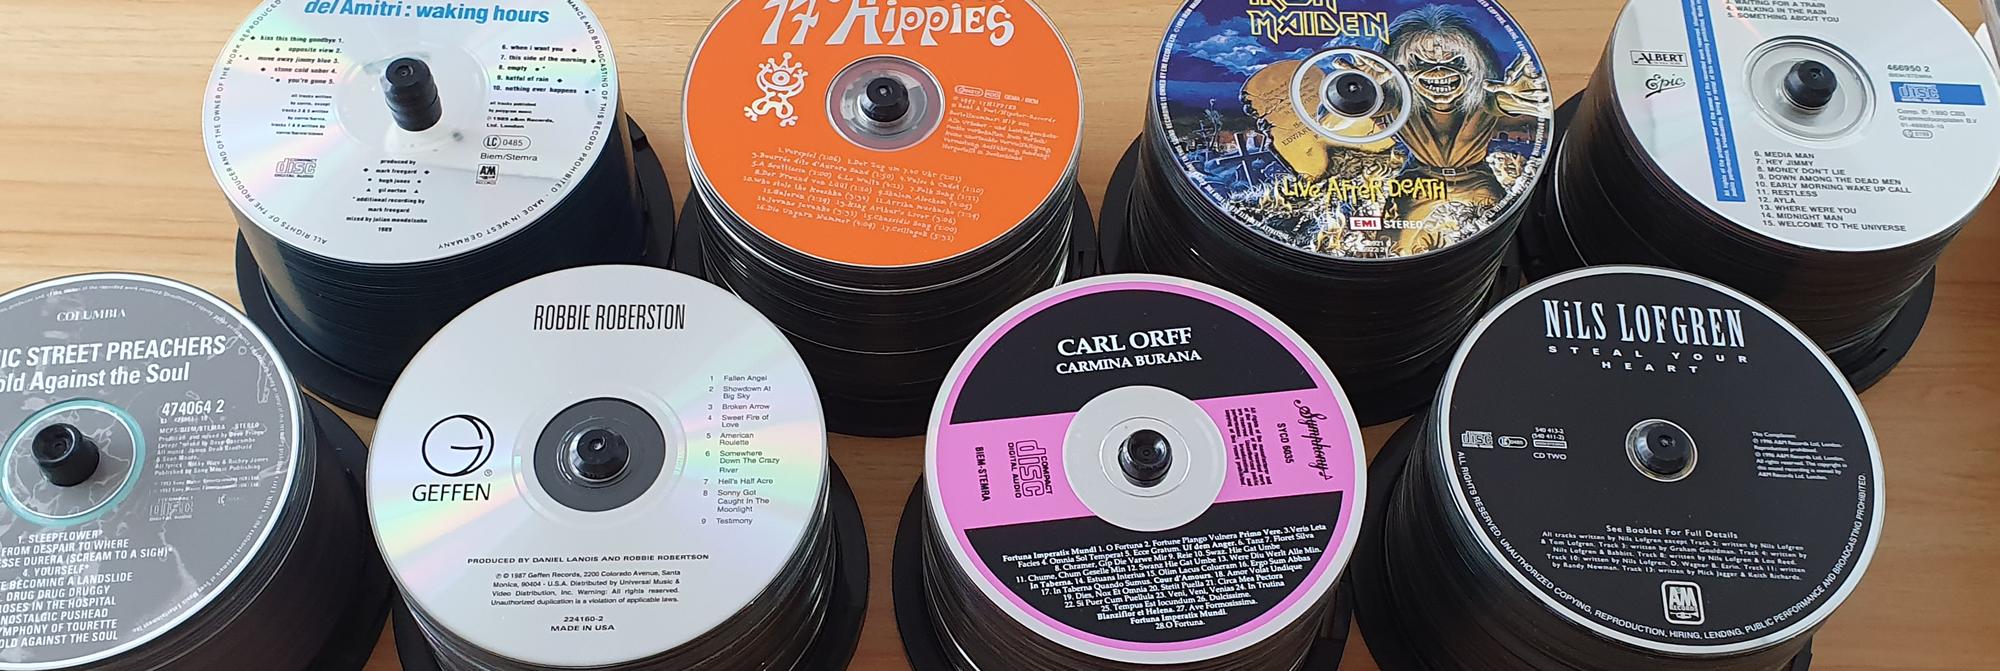 CDs rippen, CD-Sammlung einlesen